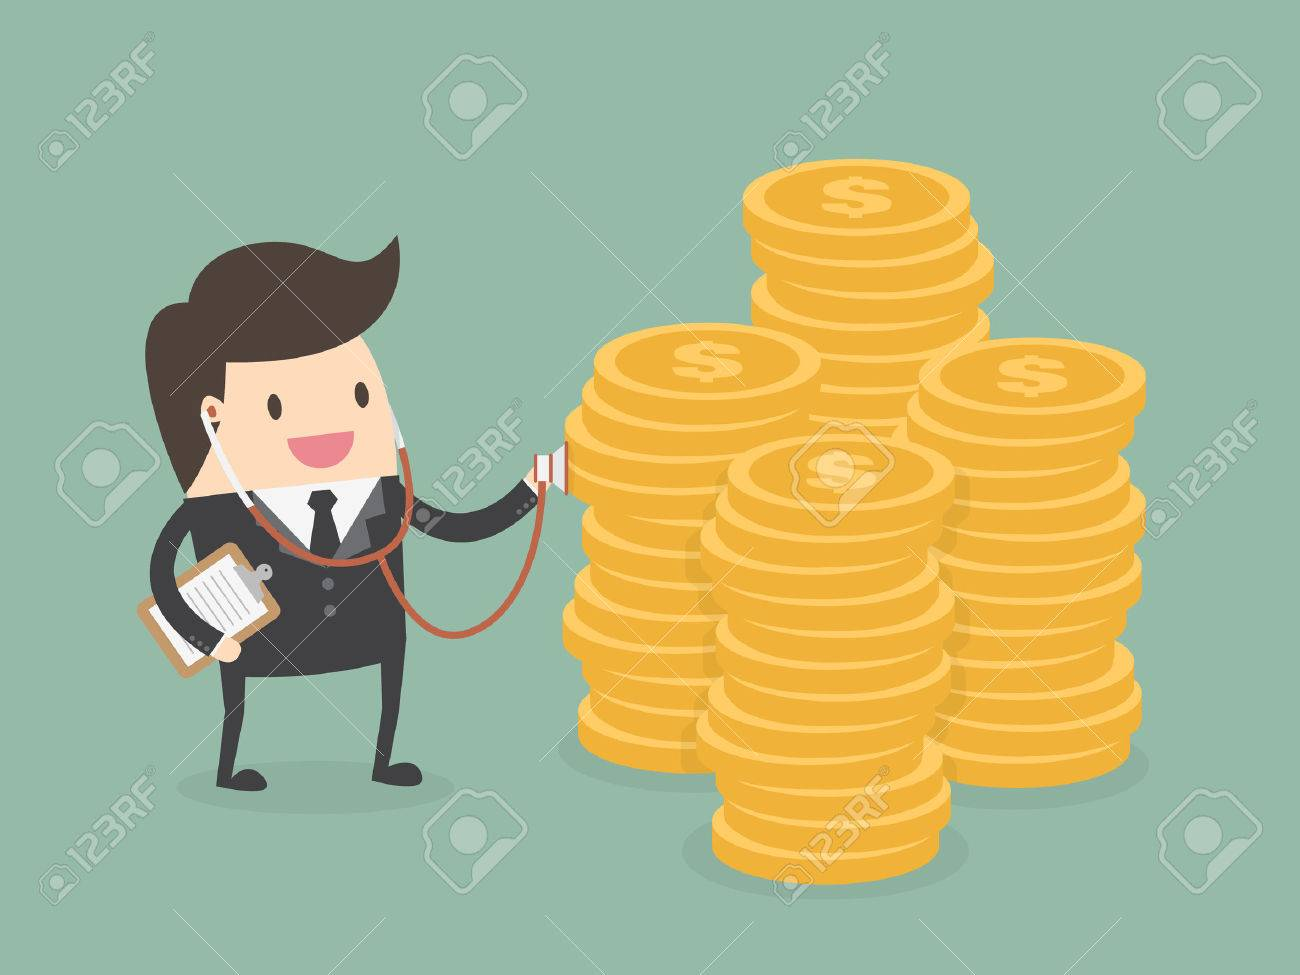 Financial health check. Businessman using stethoscope to check money health - 54429690